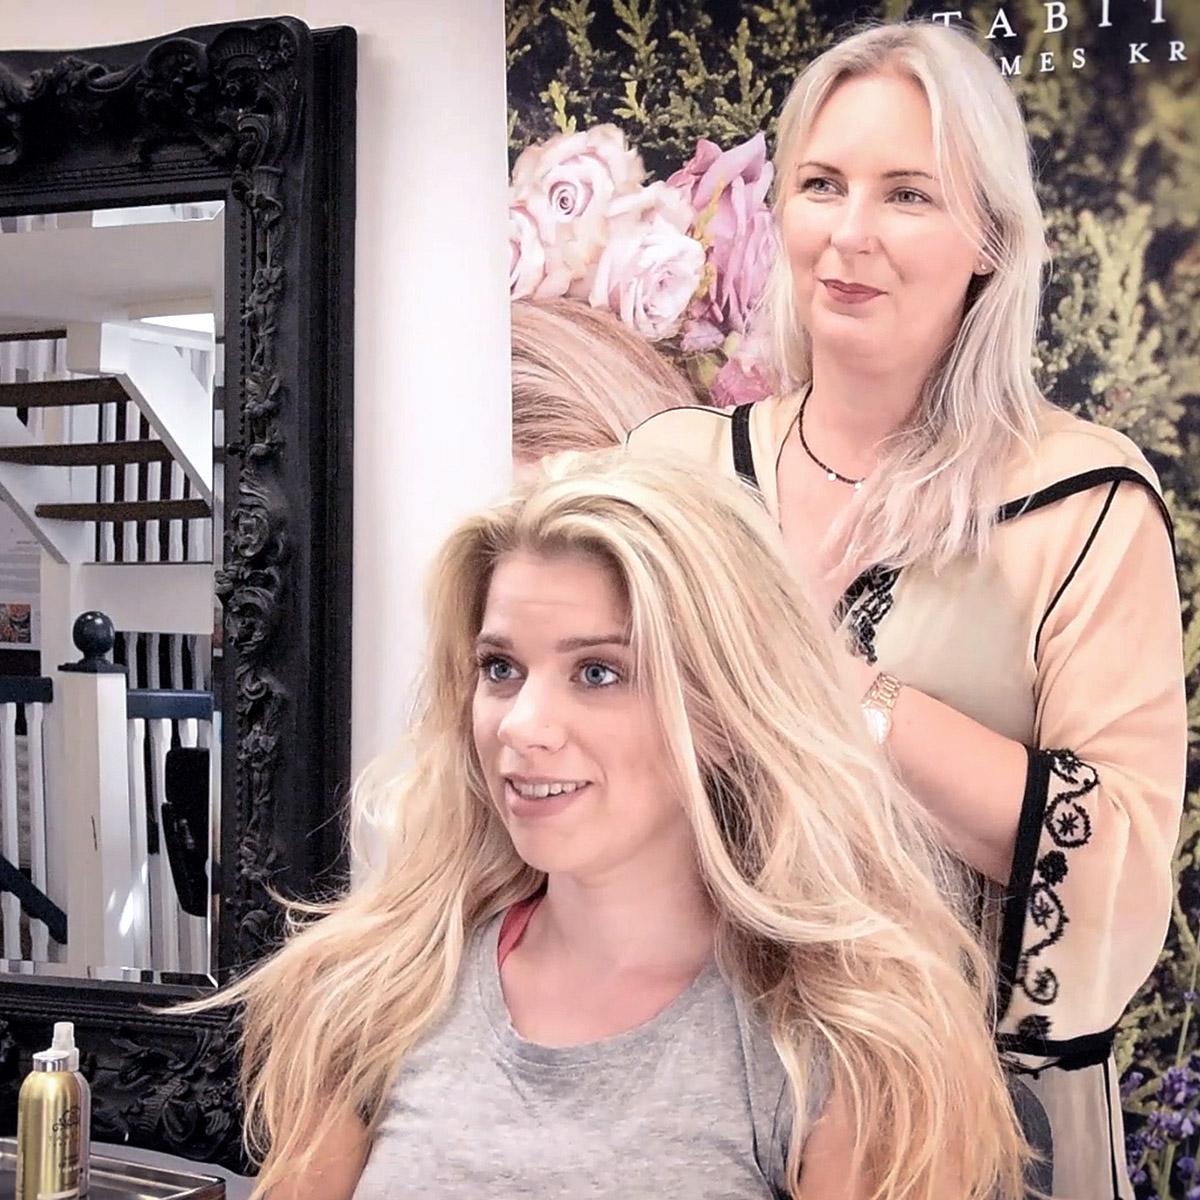 organic-hair-care-from-the-tabitha-james-kraan-salon-to-your-bathroom